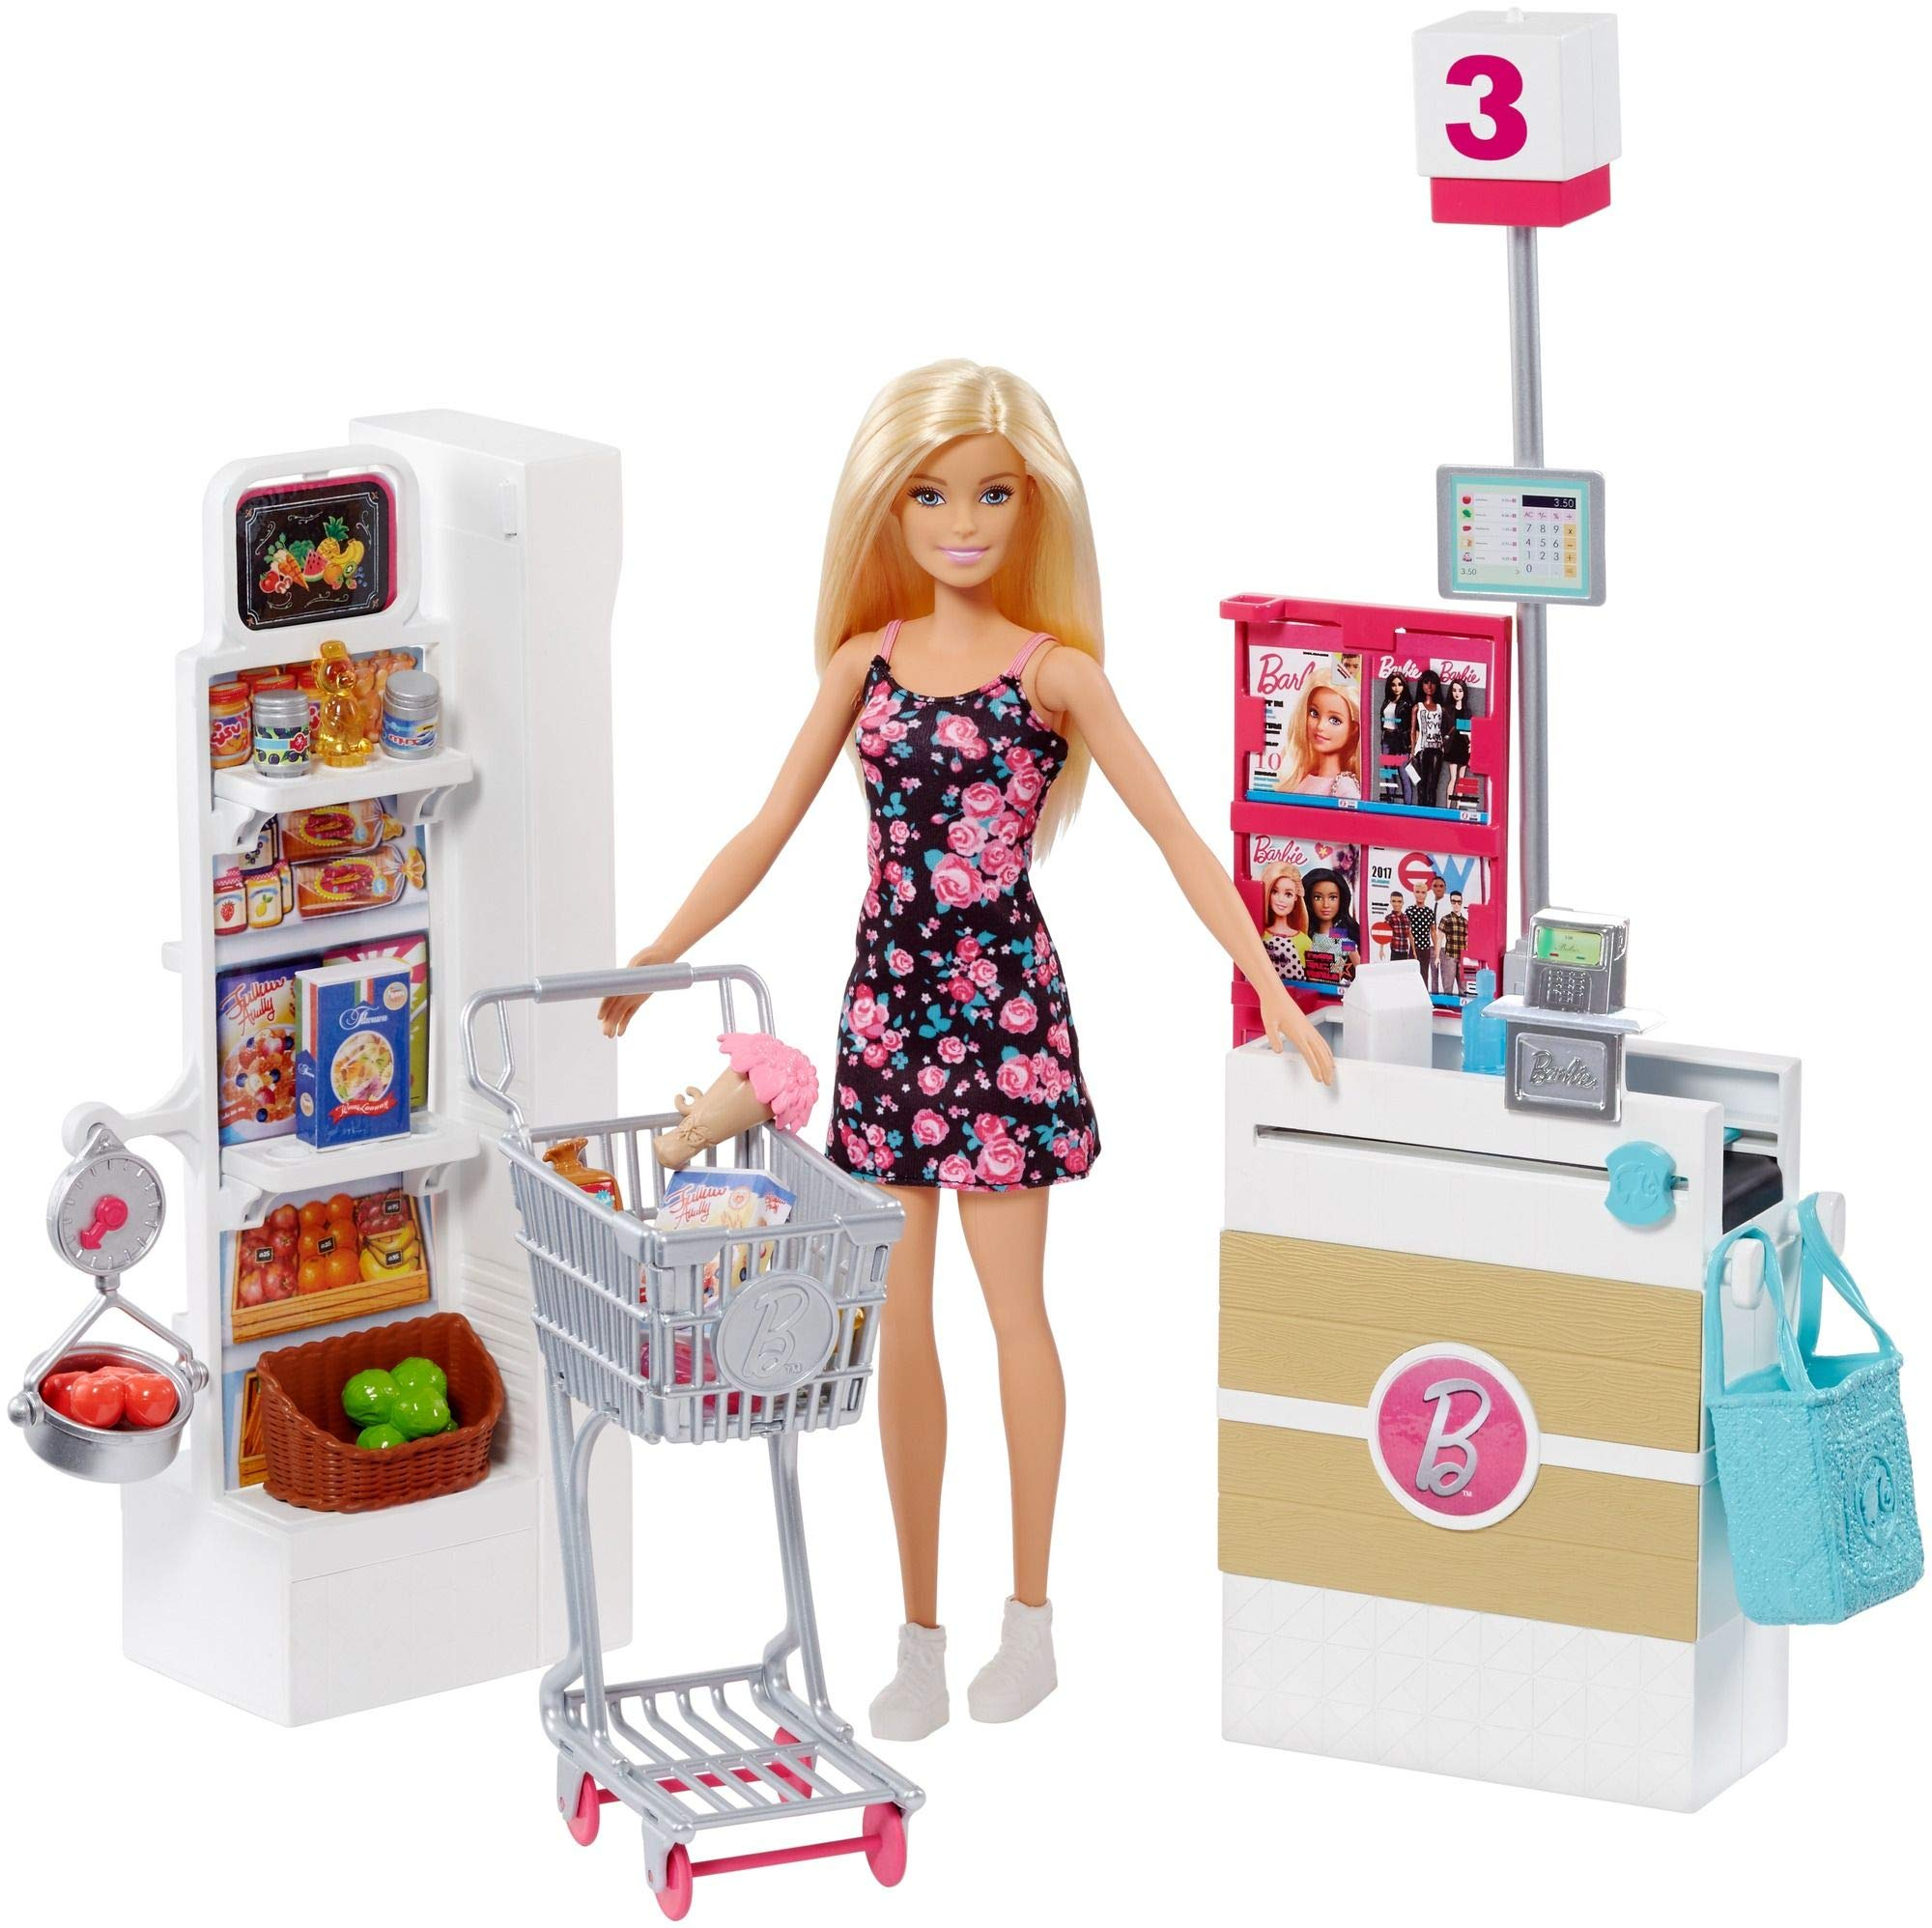 Barbie Muñeca vamos al supermercado, accesorios muñeca (Mattel FRP01) product image